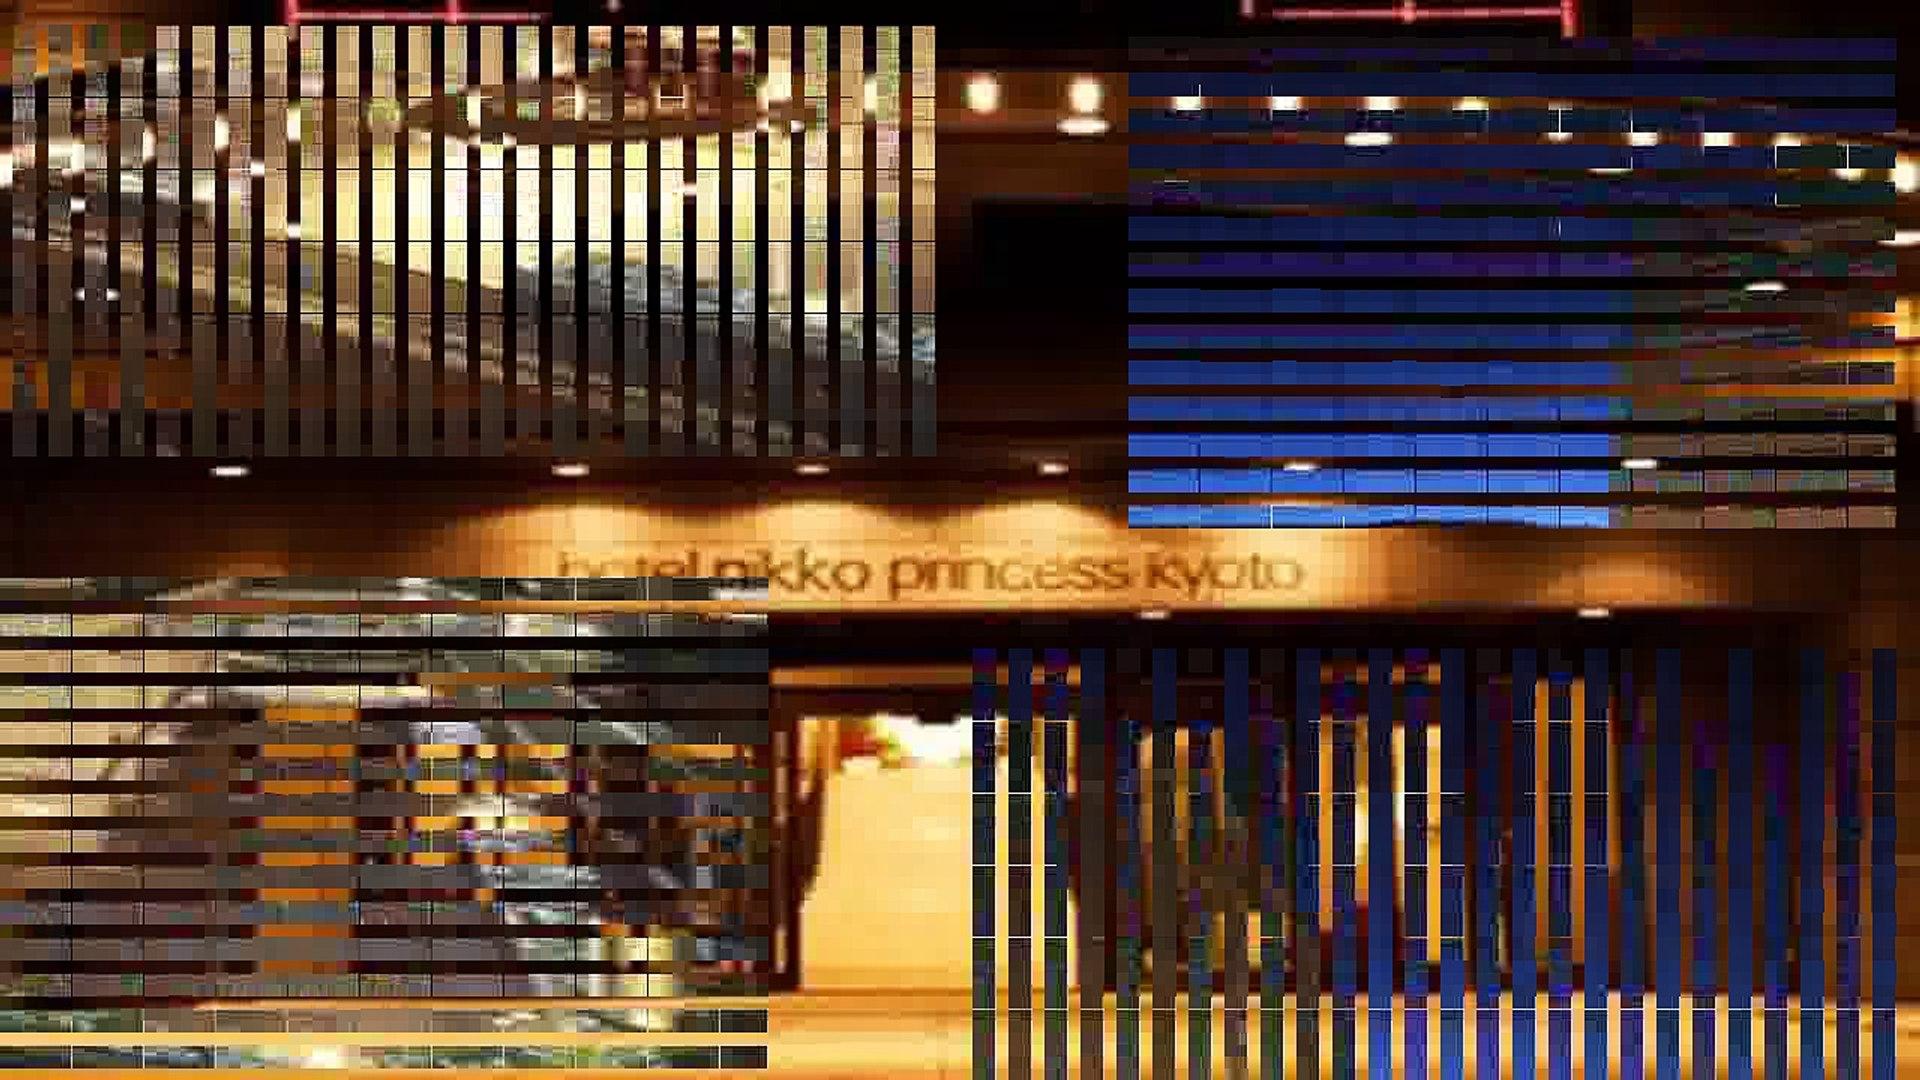 Hotels in Kyoto Hotel Nikko Princess Kyoto Japan